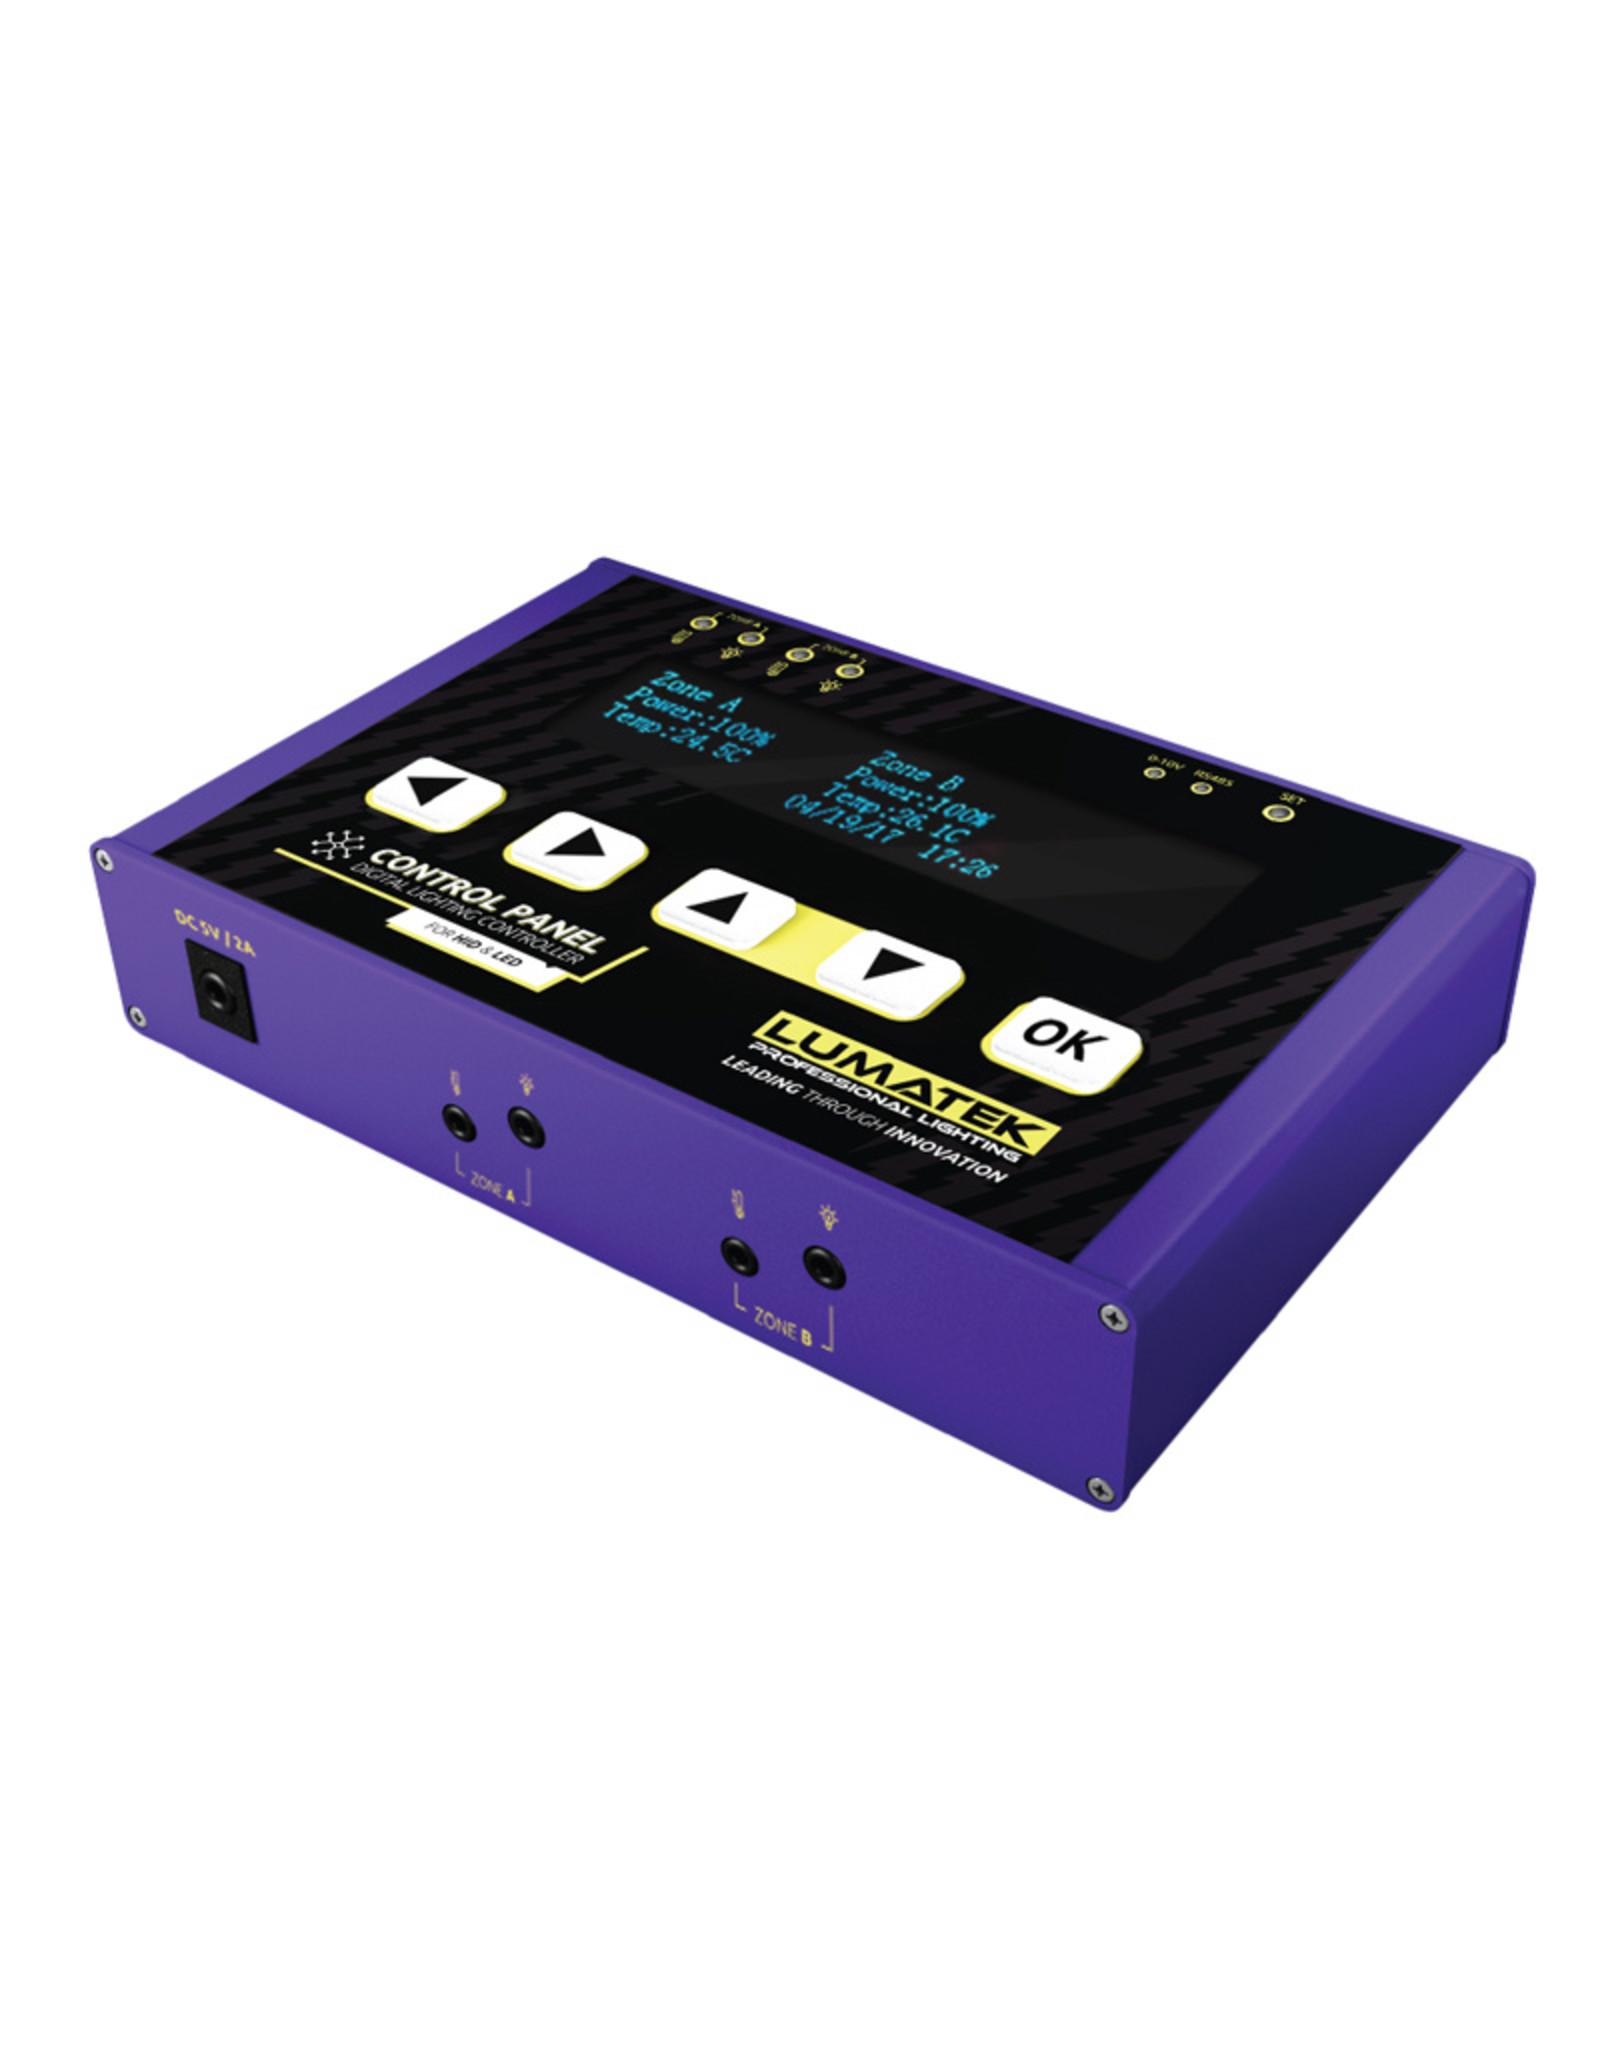 LUMATEK LUMATEK HID & LED Control Panel plus 2.0